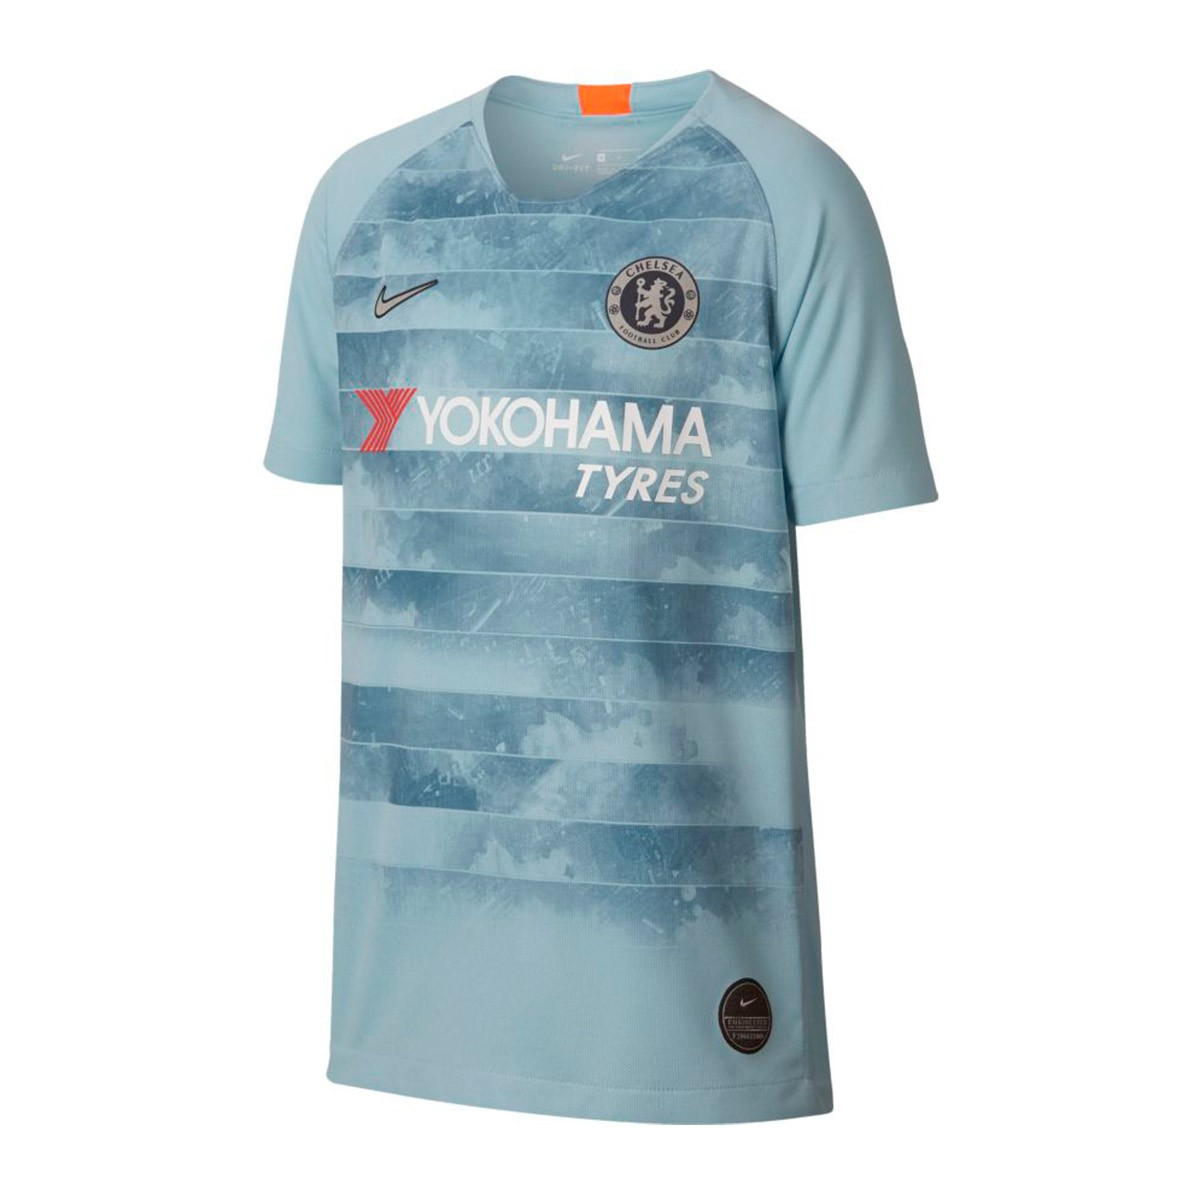 9e30121955554 Playera Nike Chelsea FC Stadium Tercera Equipación 2018-2019 Niño Ocean  bliss-Metallic silver - Tienda de fútbol Fútbol Emotion